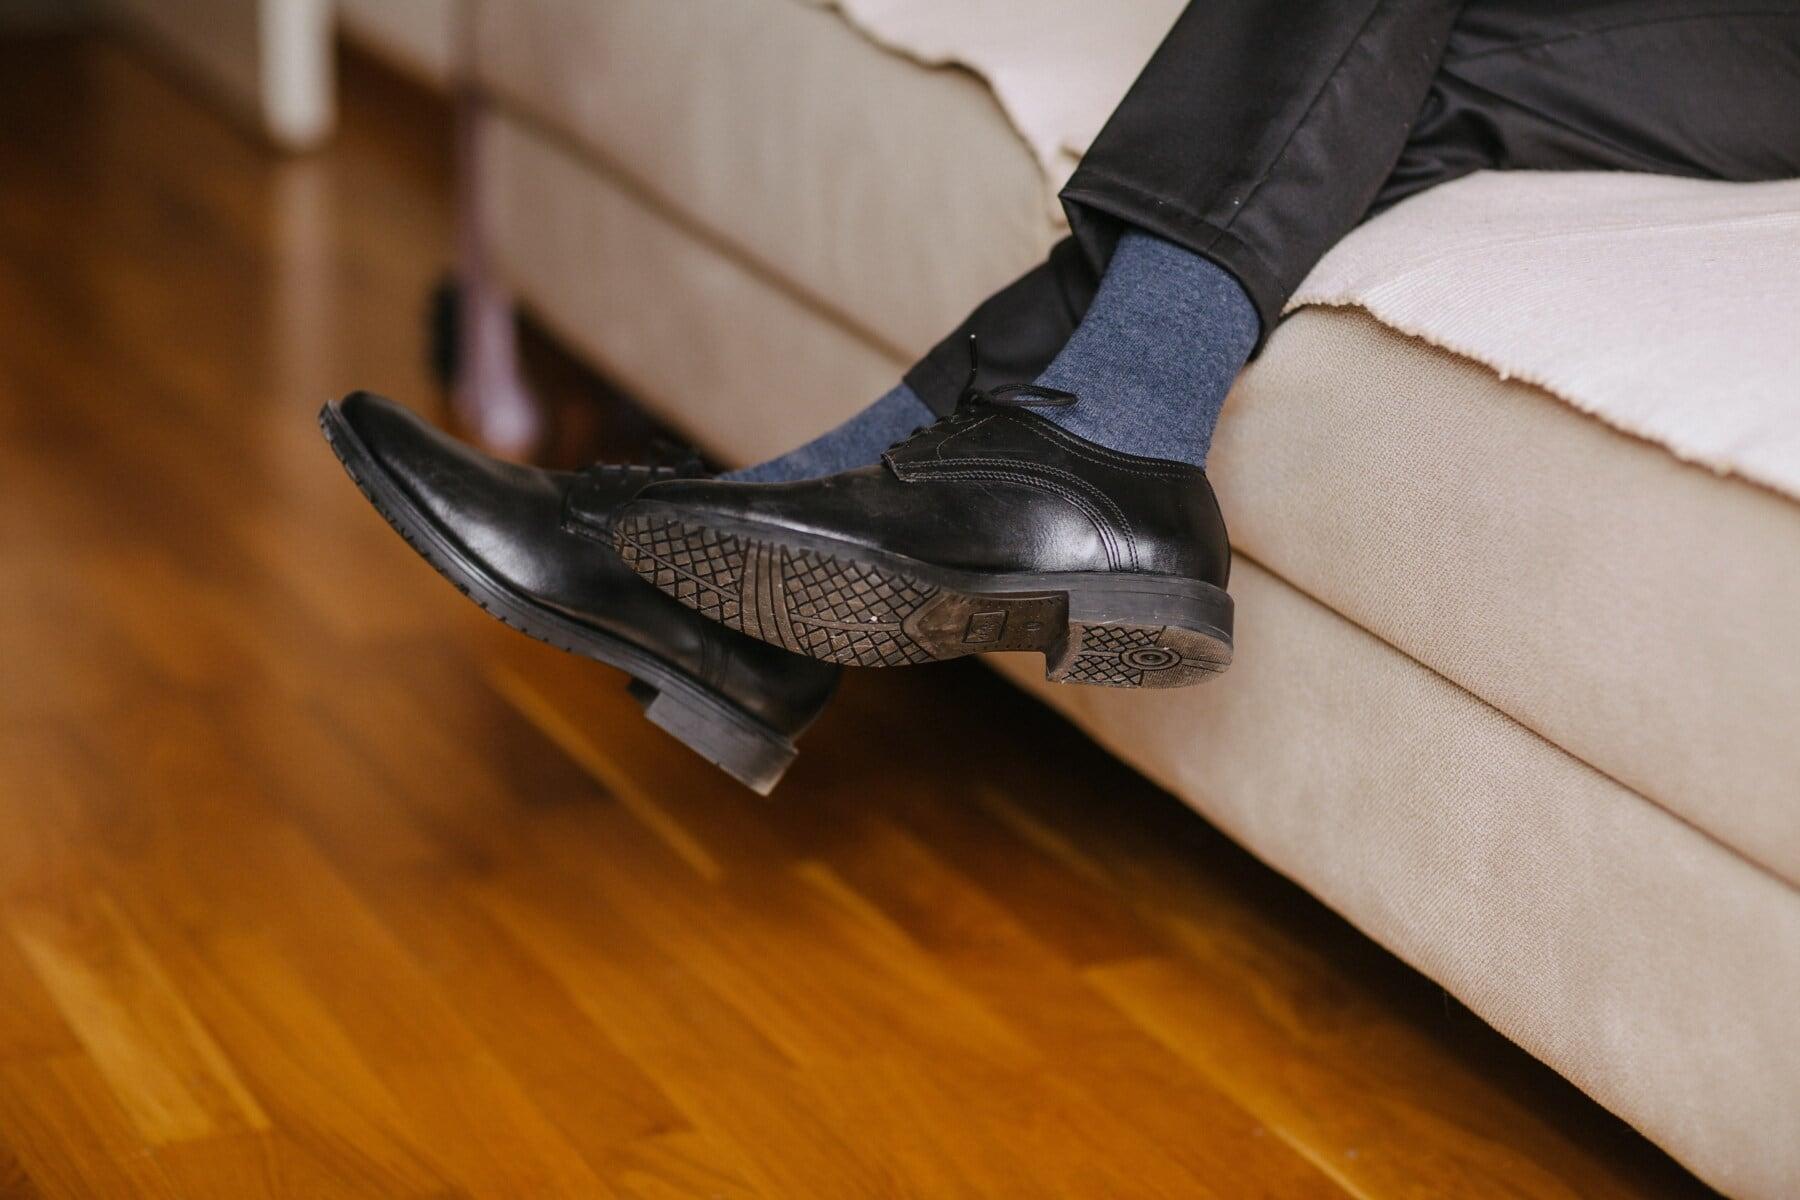 black, shoes, leather, pants, classic, comfortable, man, socks, legs, room